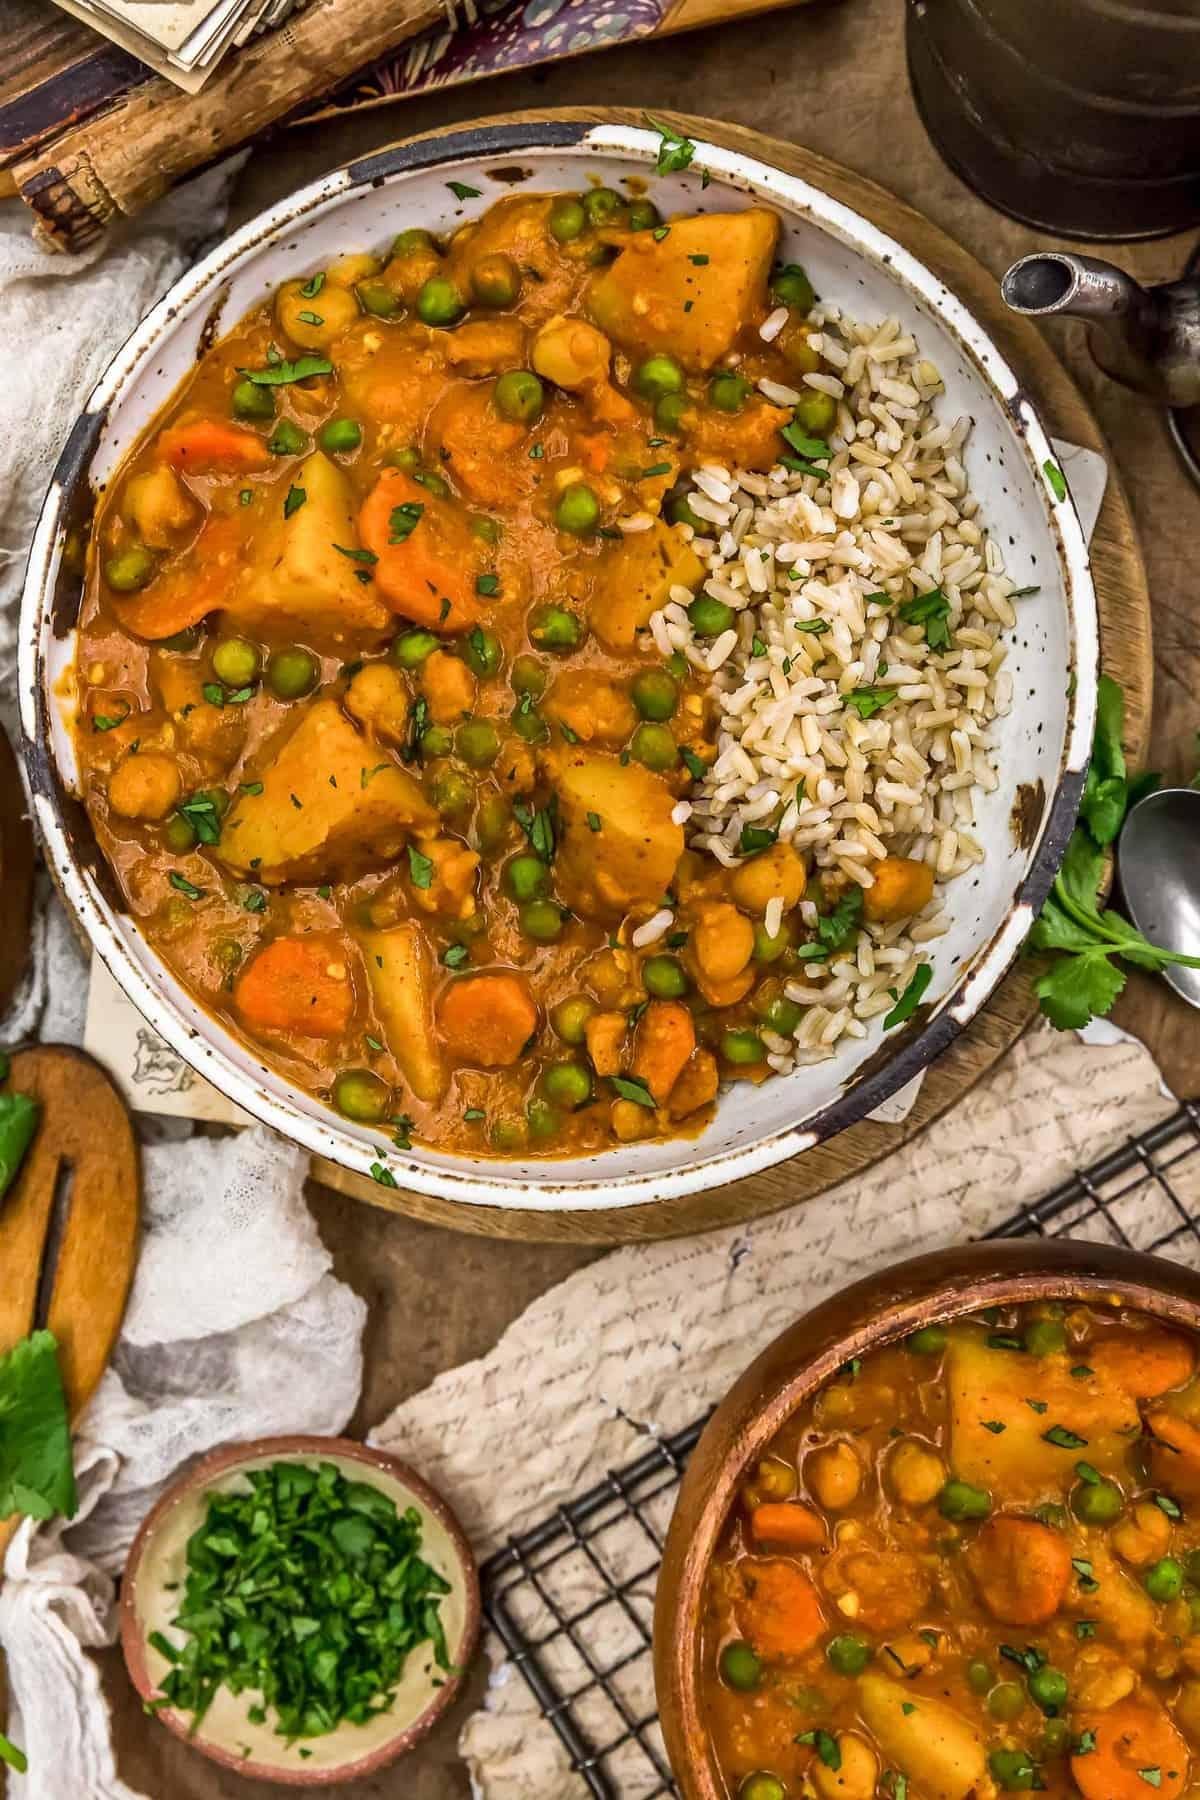 Bowl of Thai Vegetable Massaman Curry